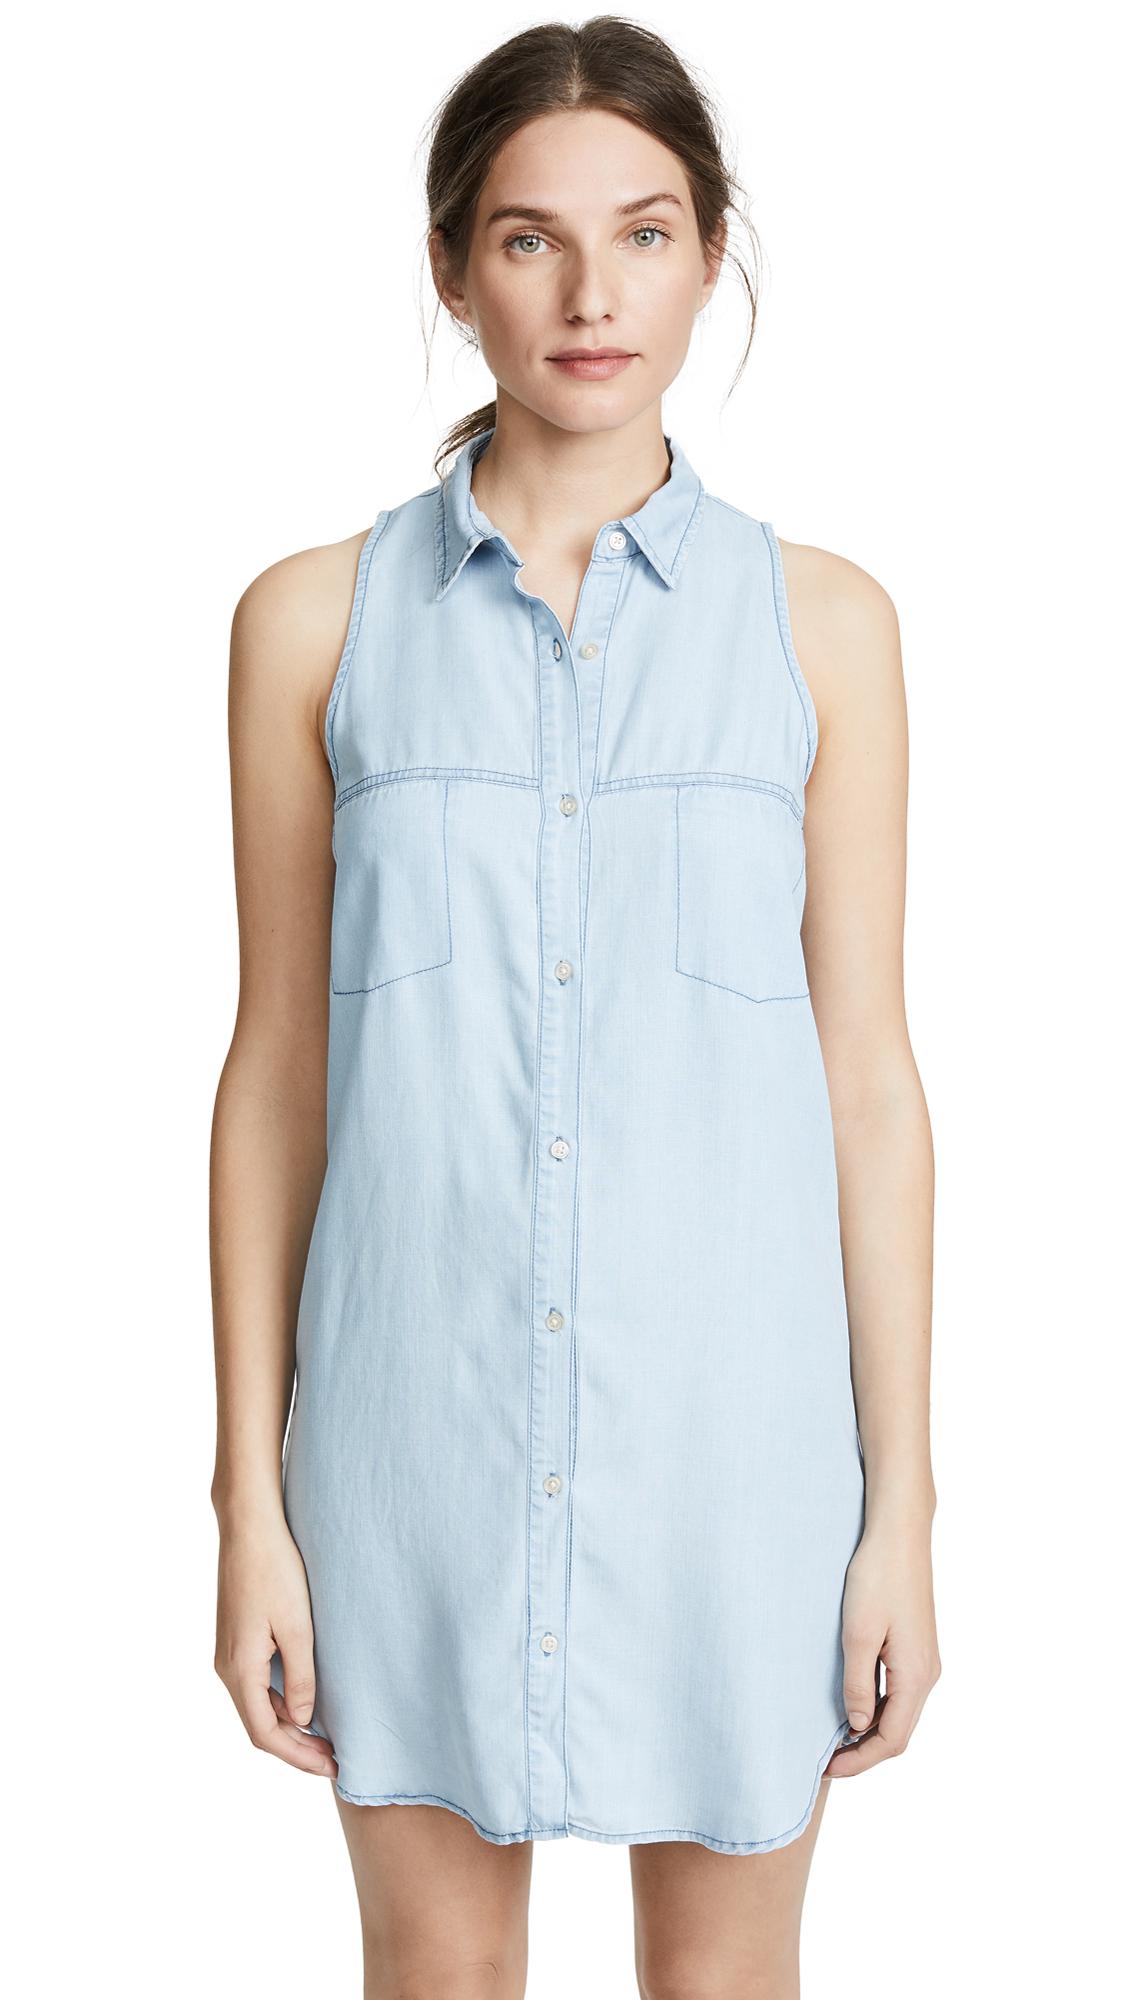 BB Dakota Brantley Shirtdress In Chambray